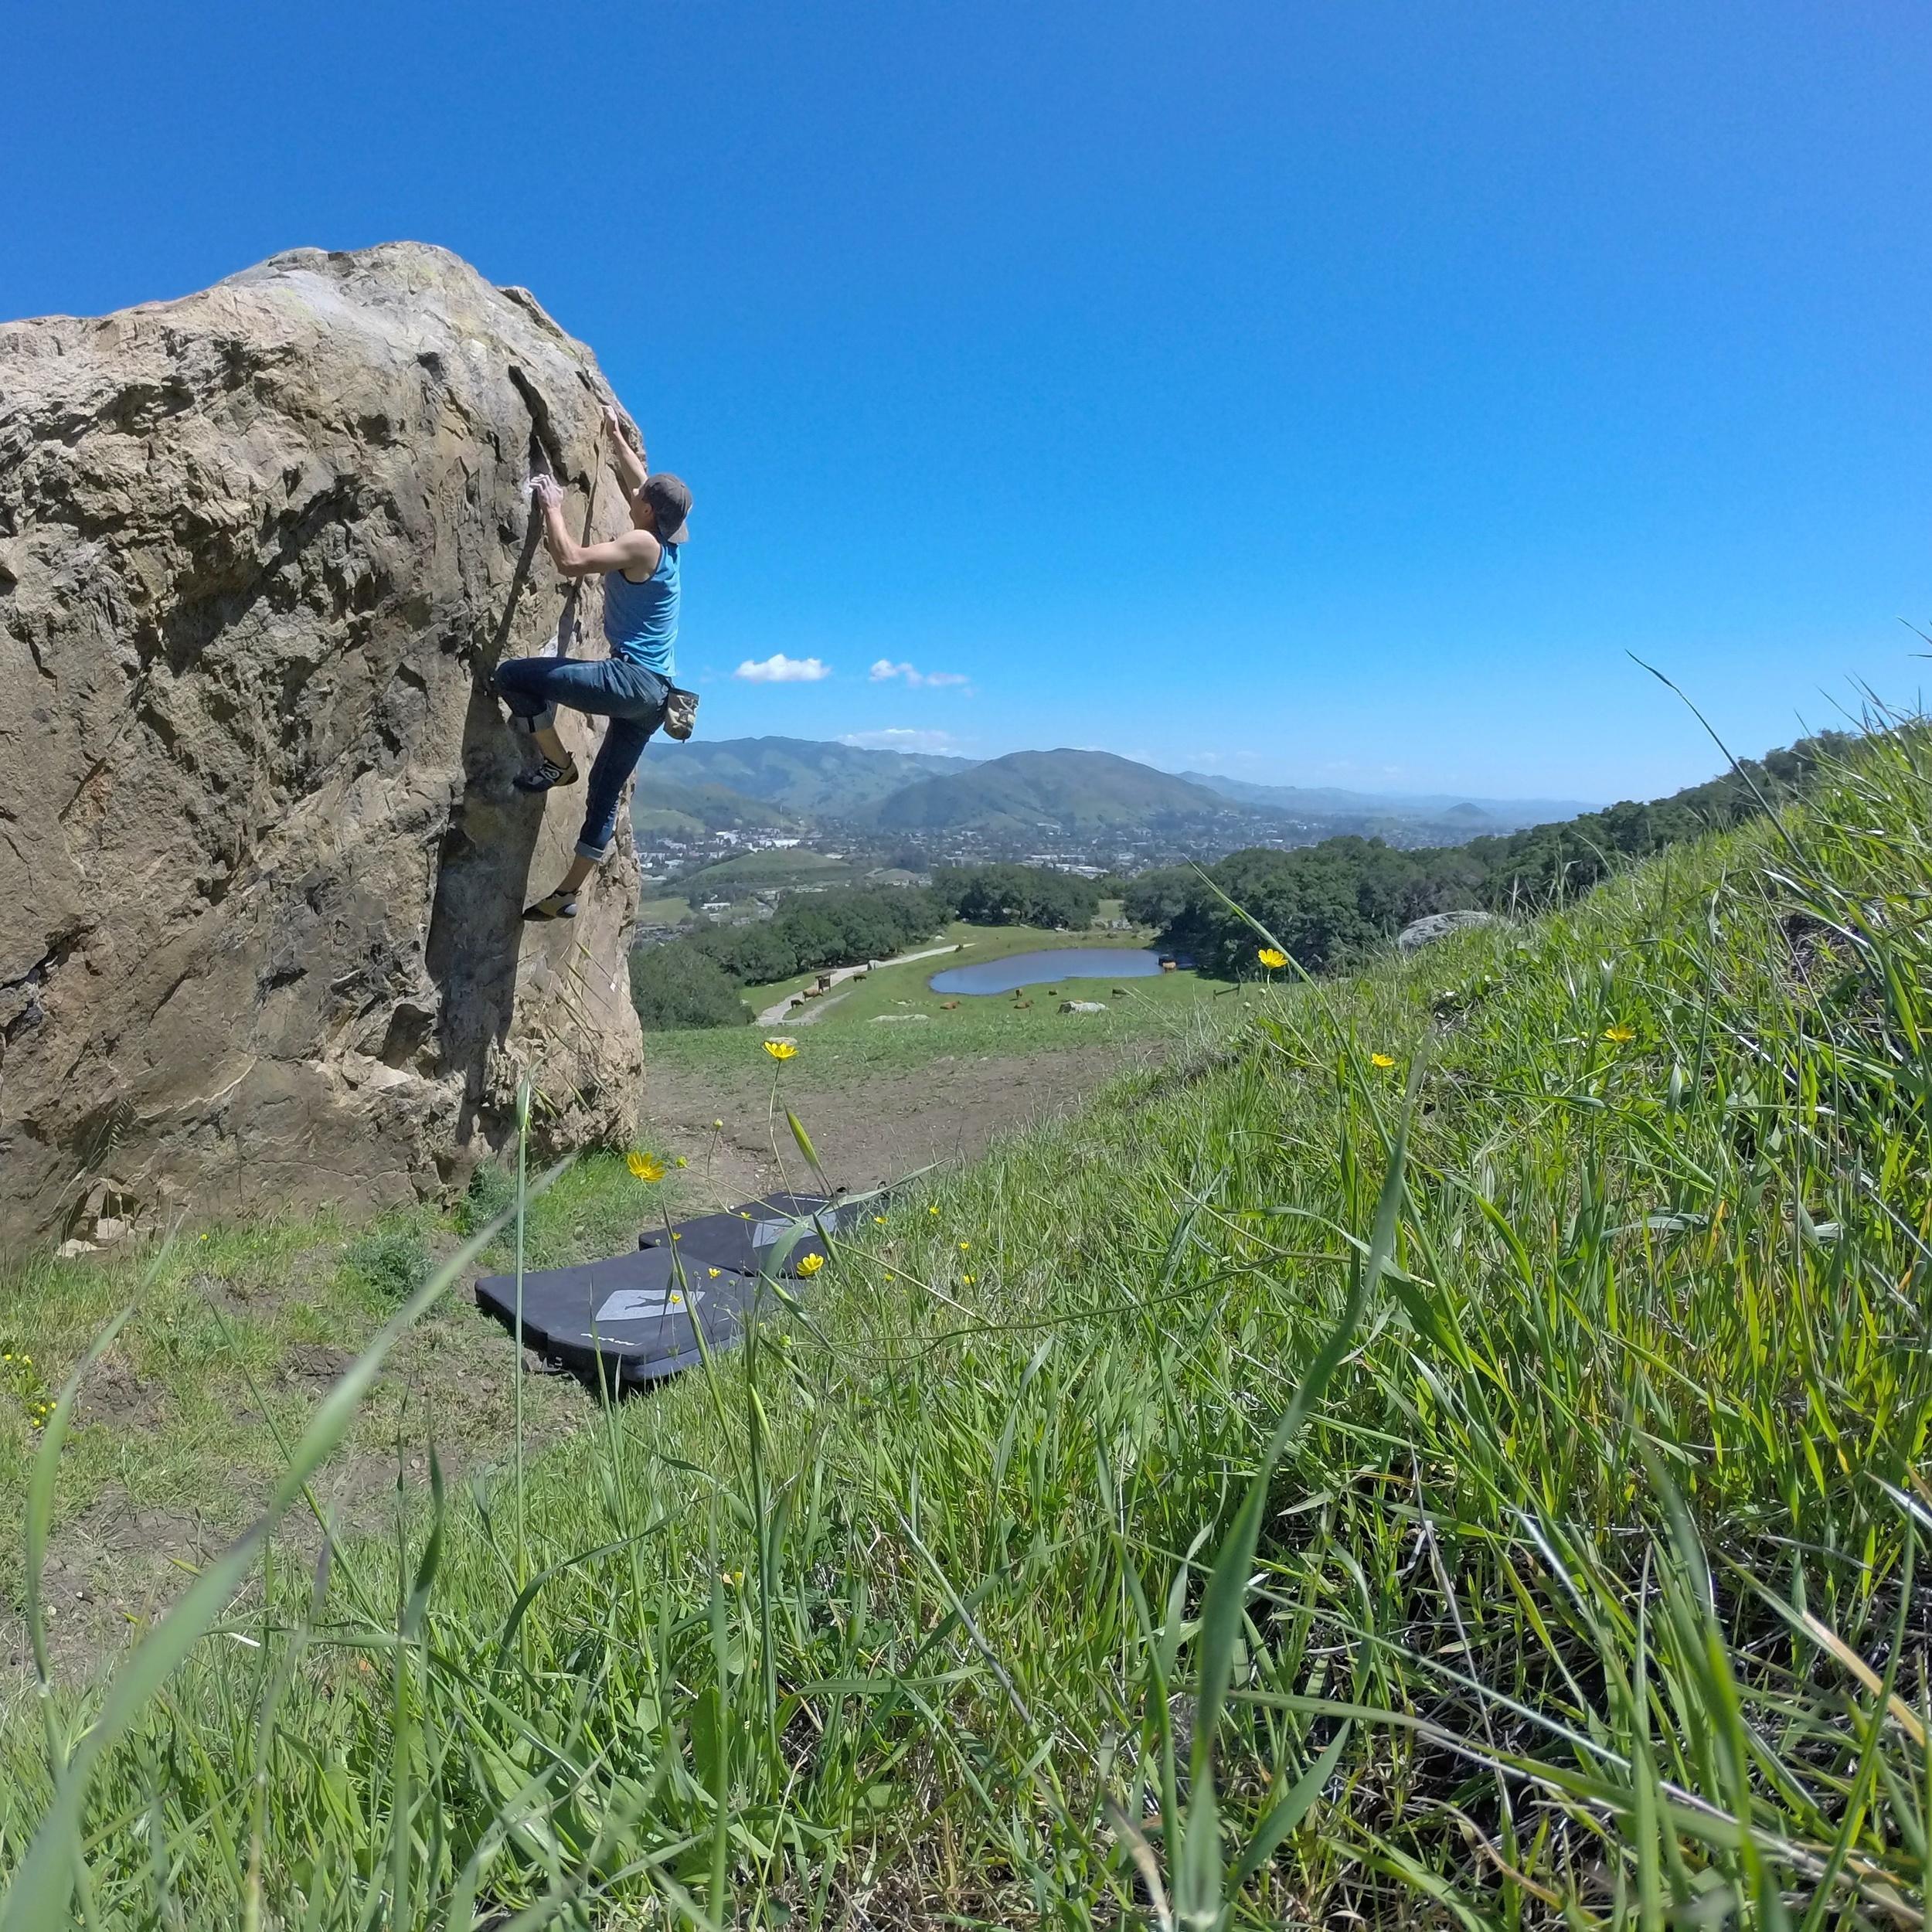 Bouldering over San Luis Obispo.